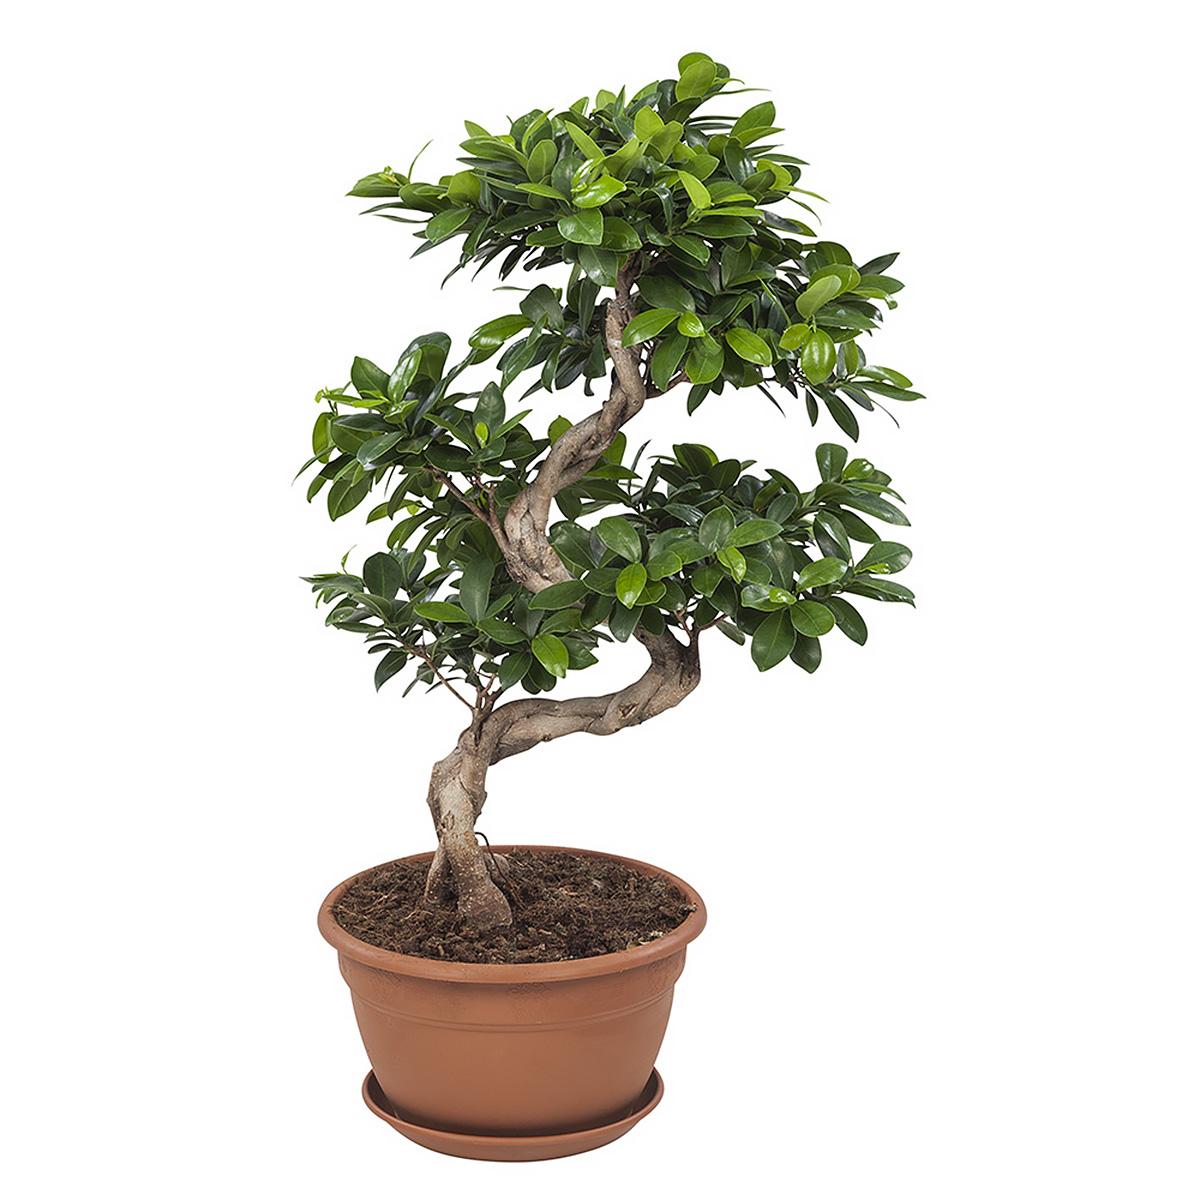 Plant 70 cm: Ficus Gin Seng Bonsai